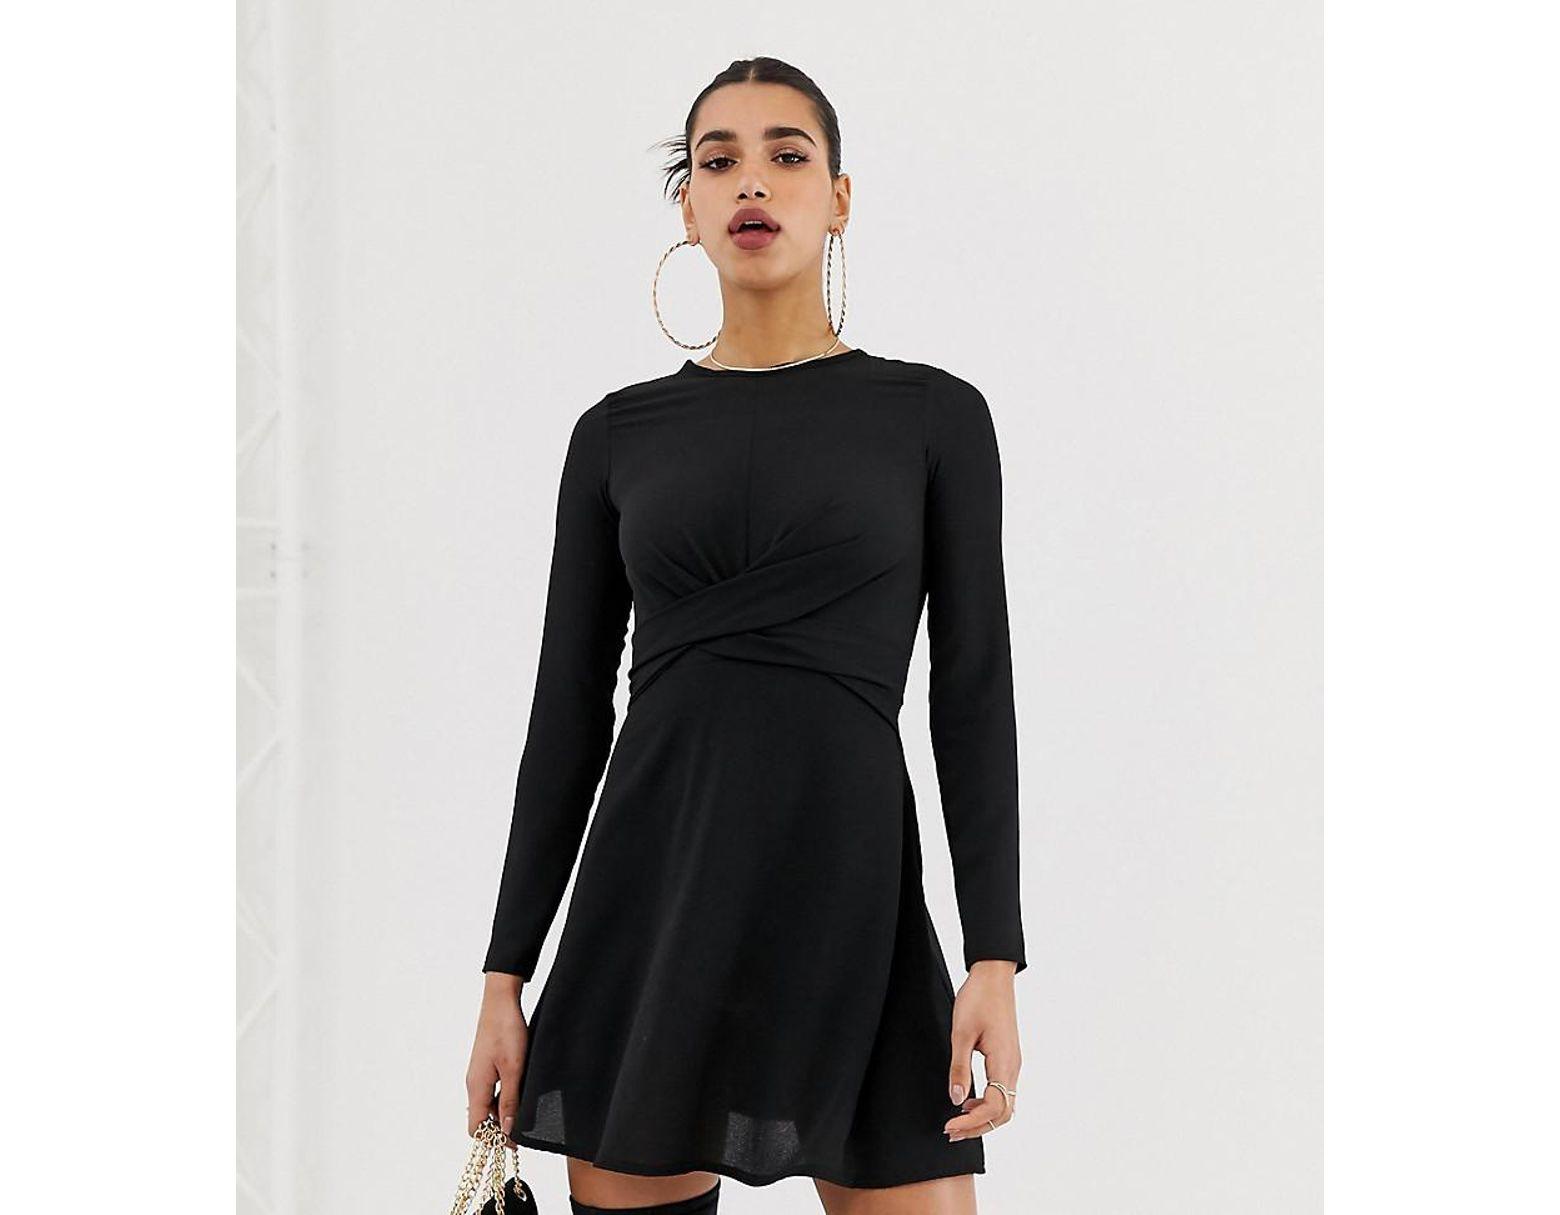 207a6d0df9bc Boohoo Exclusive Twist Wrap Skater Mini Dress In Black in Black - Lyst